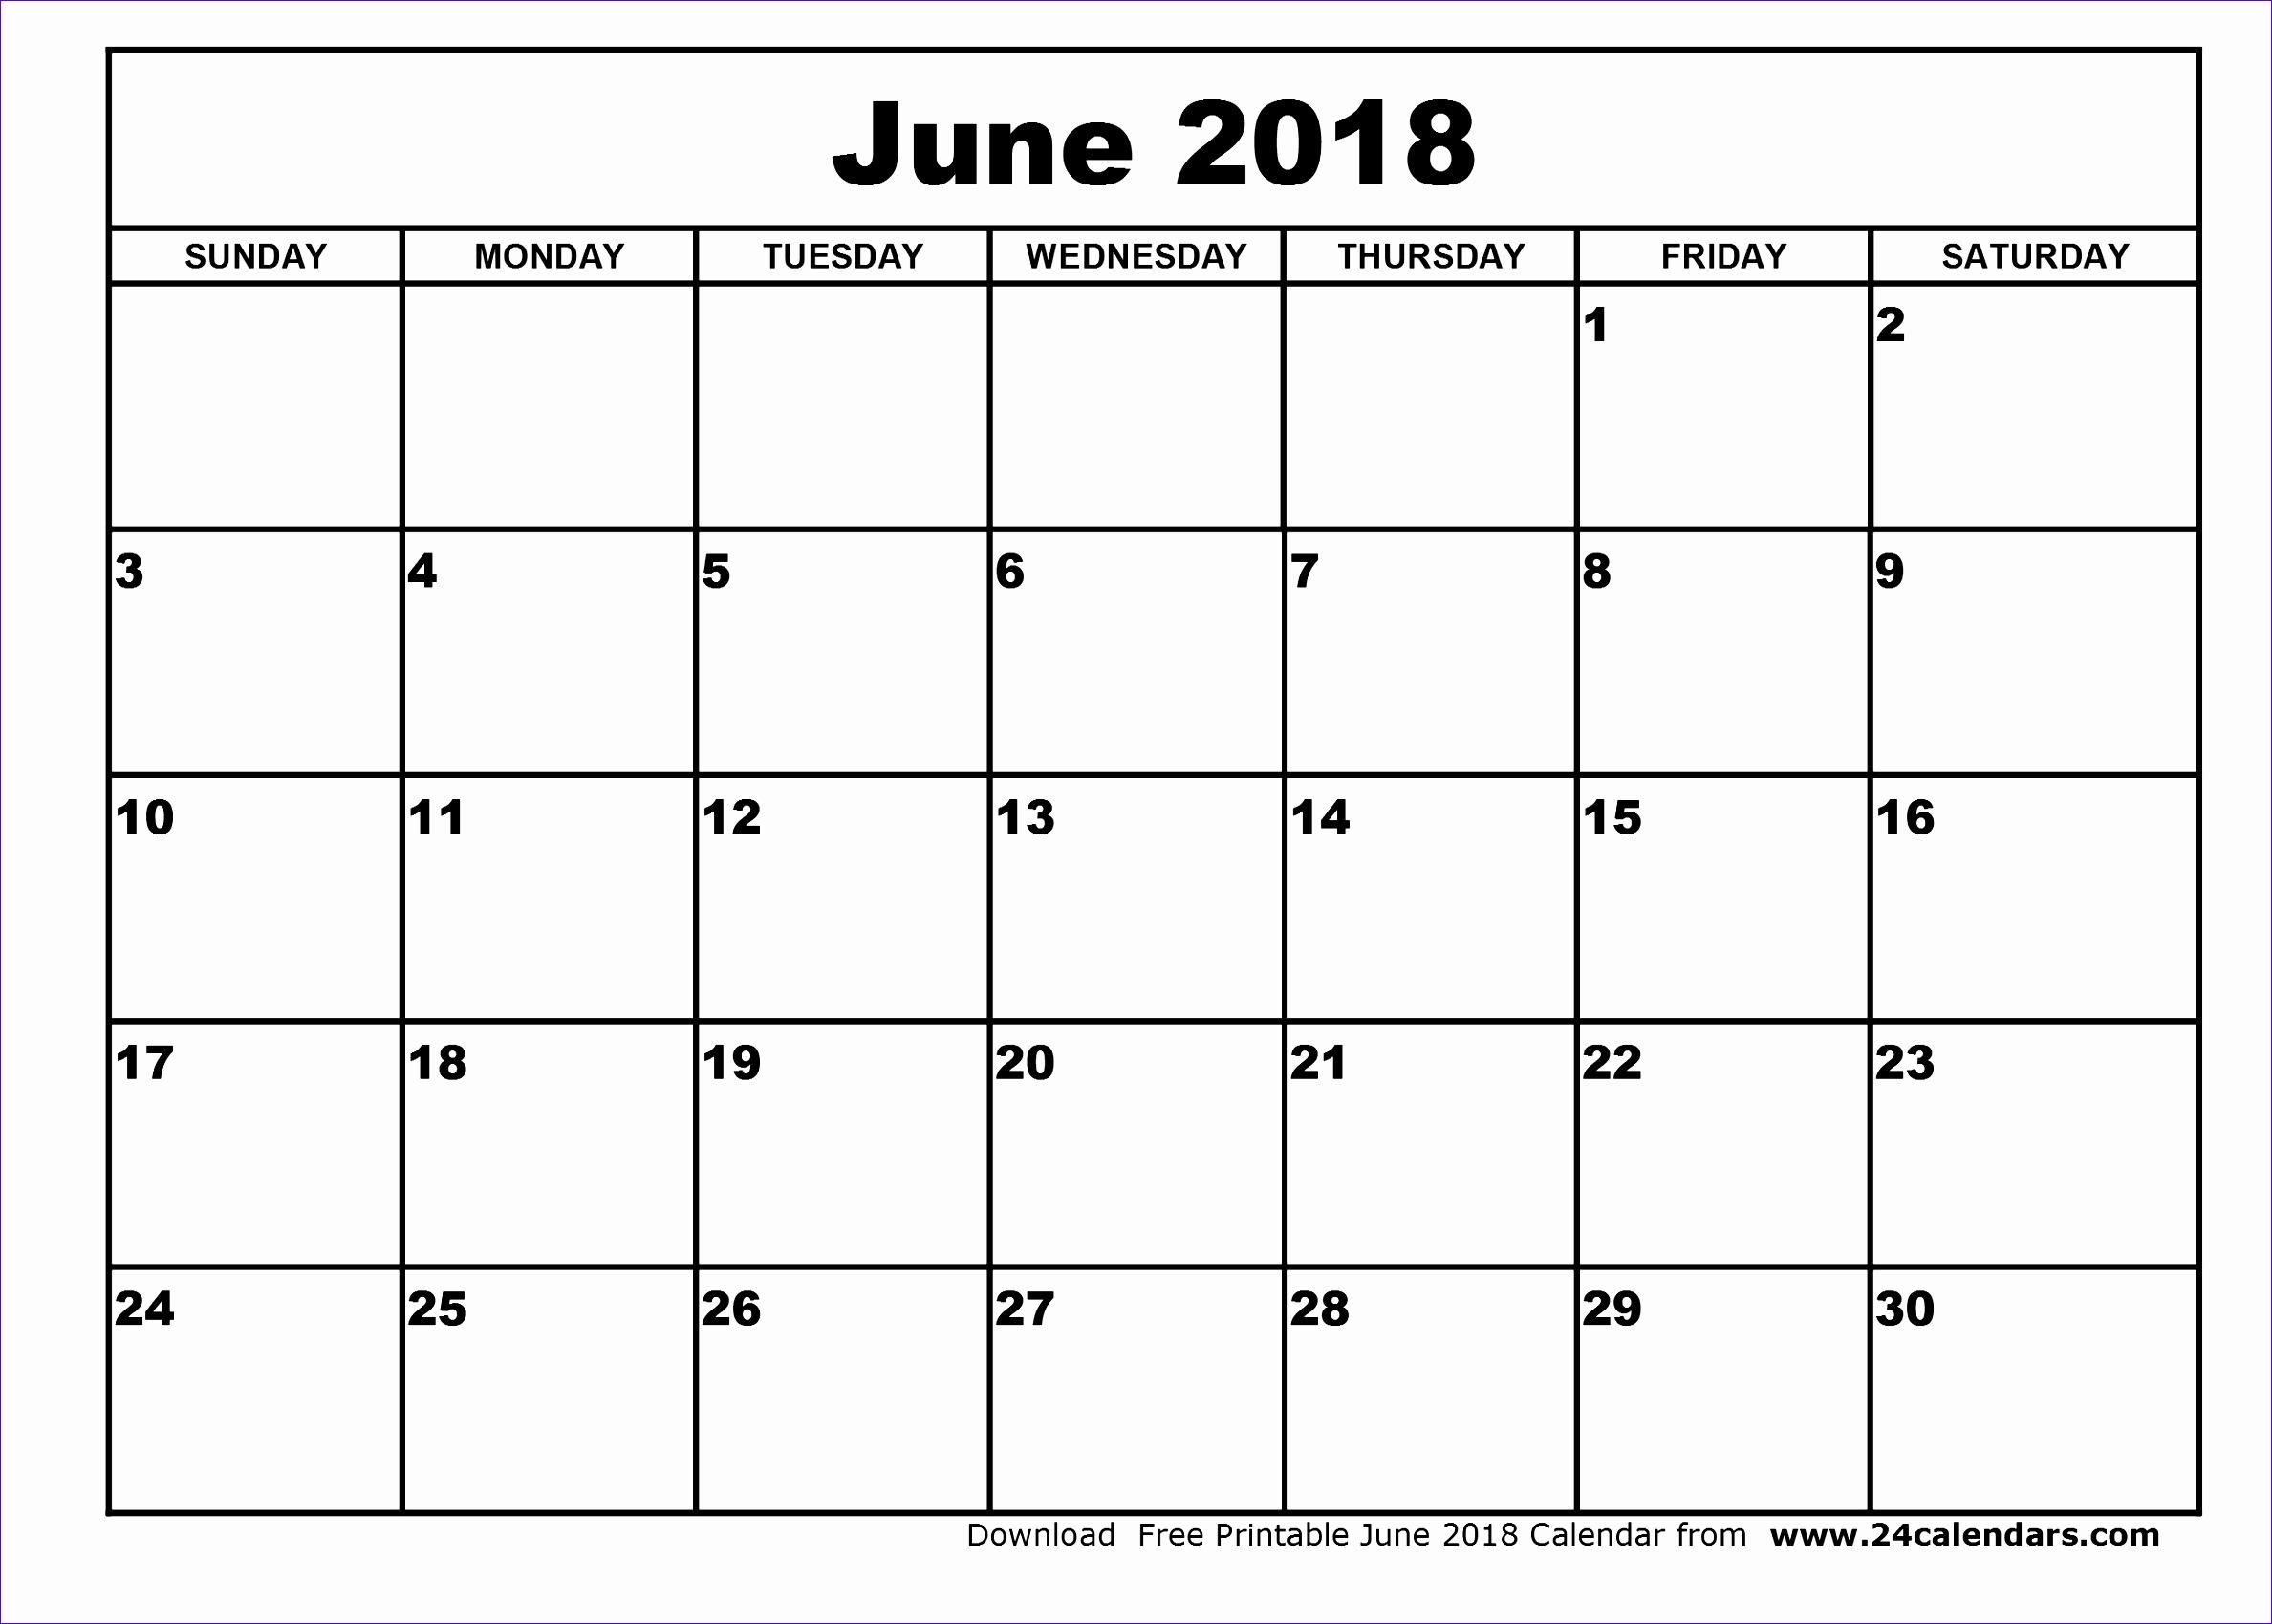 june 2018 calendar template 1718 23771699